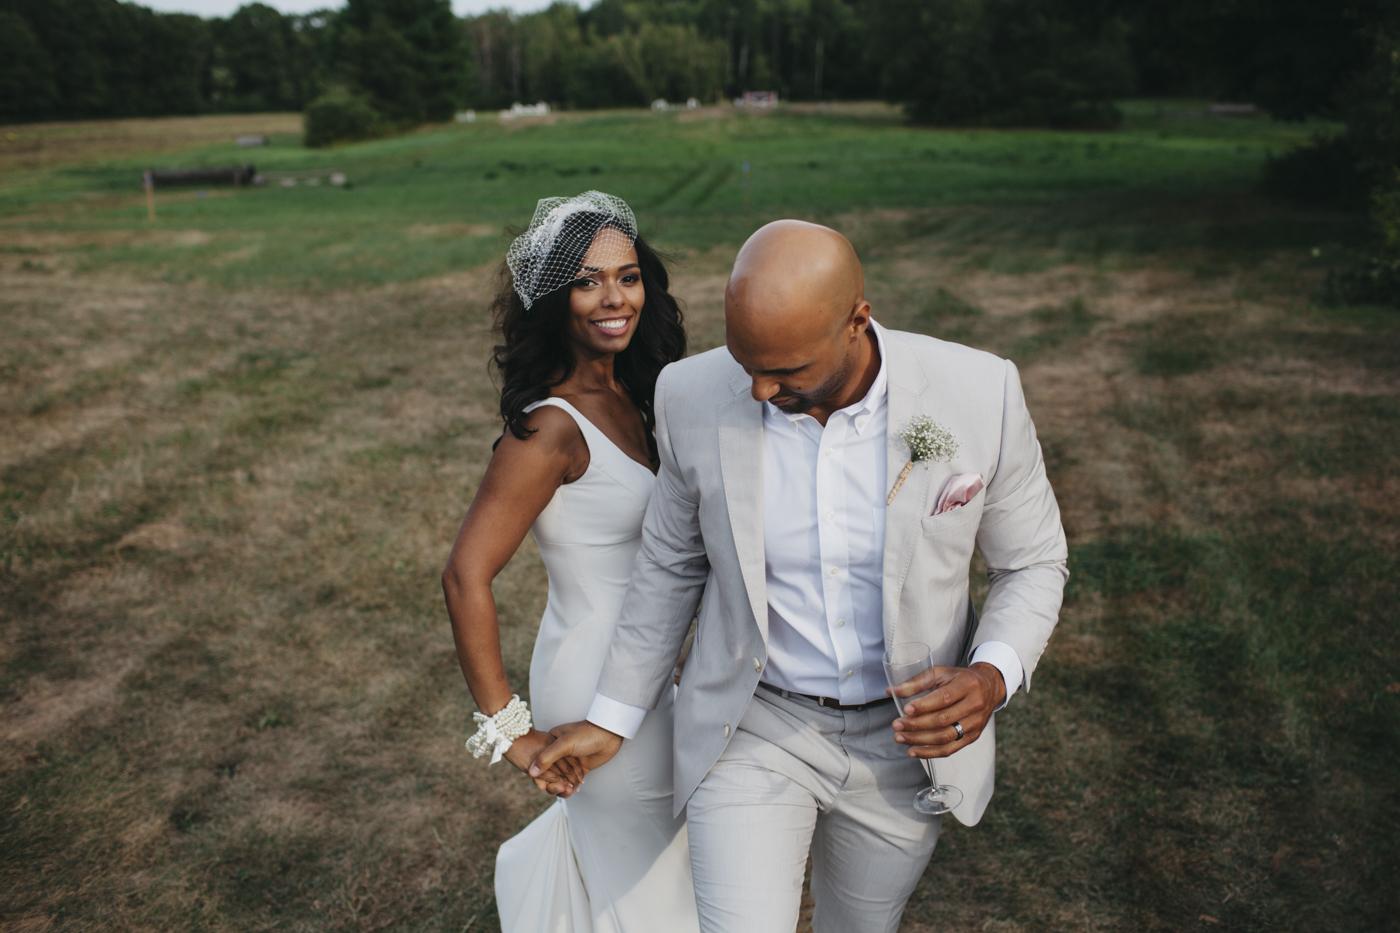 Toni_Earl_Rest_and_Be_Thankful_farm_wedding_maine_016.jpg